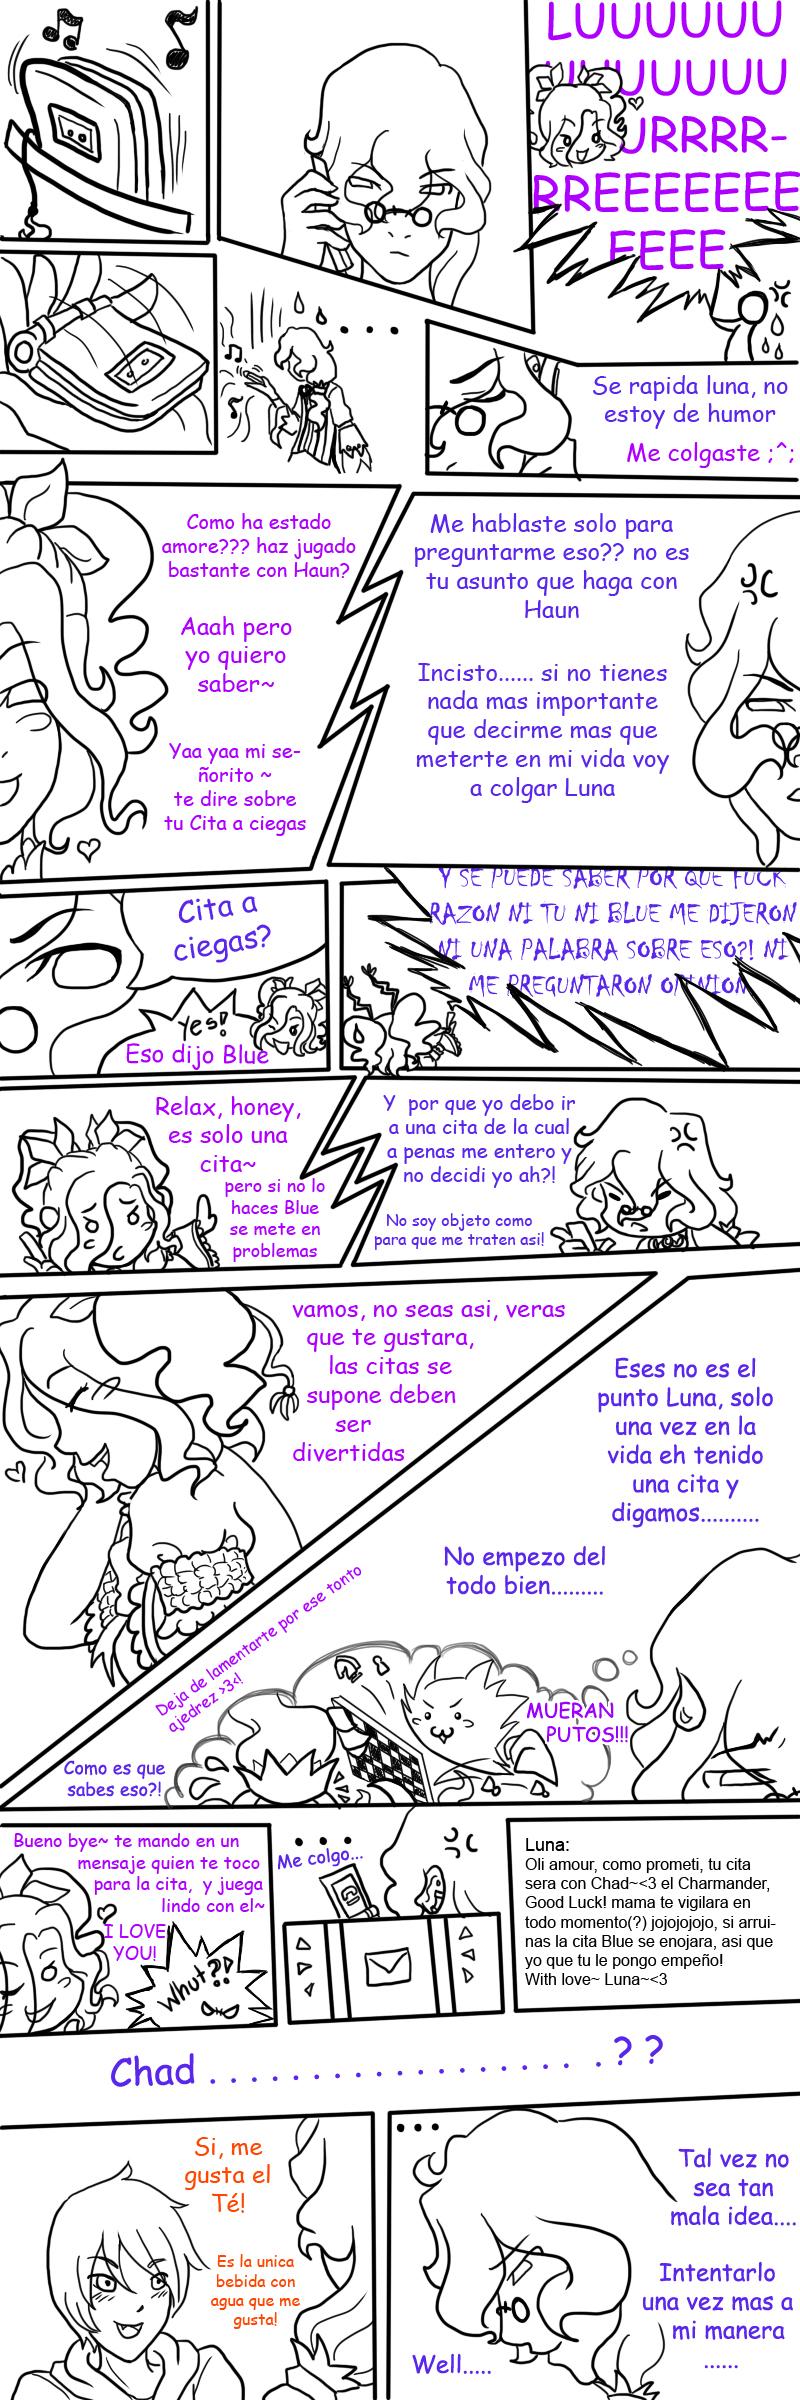 Cita a ciegas part 1 by Bludile